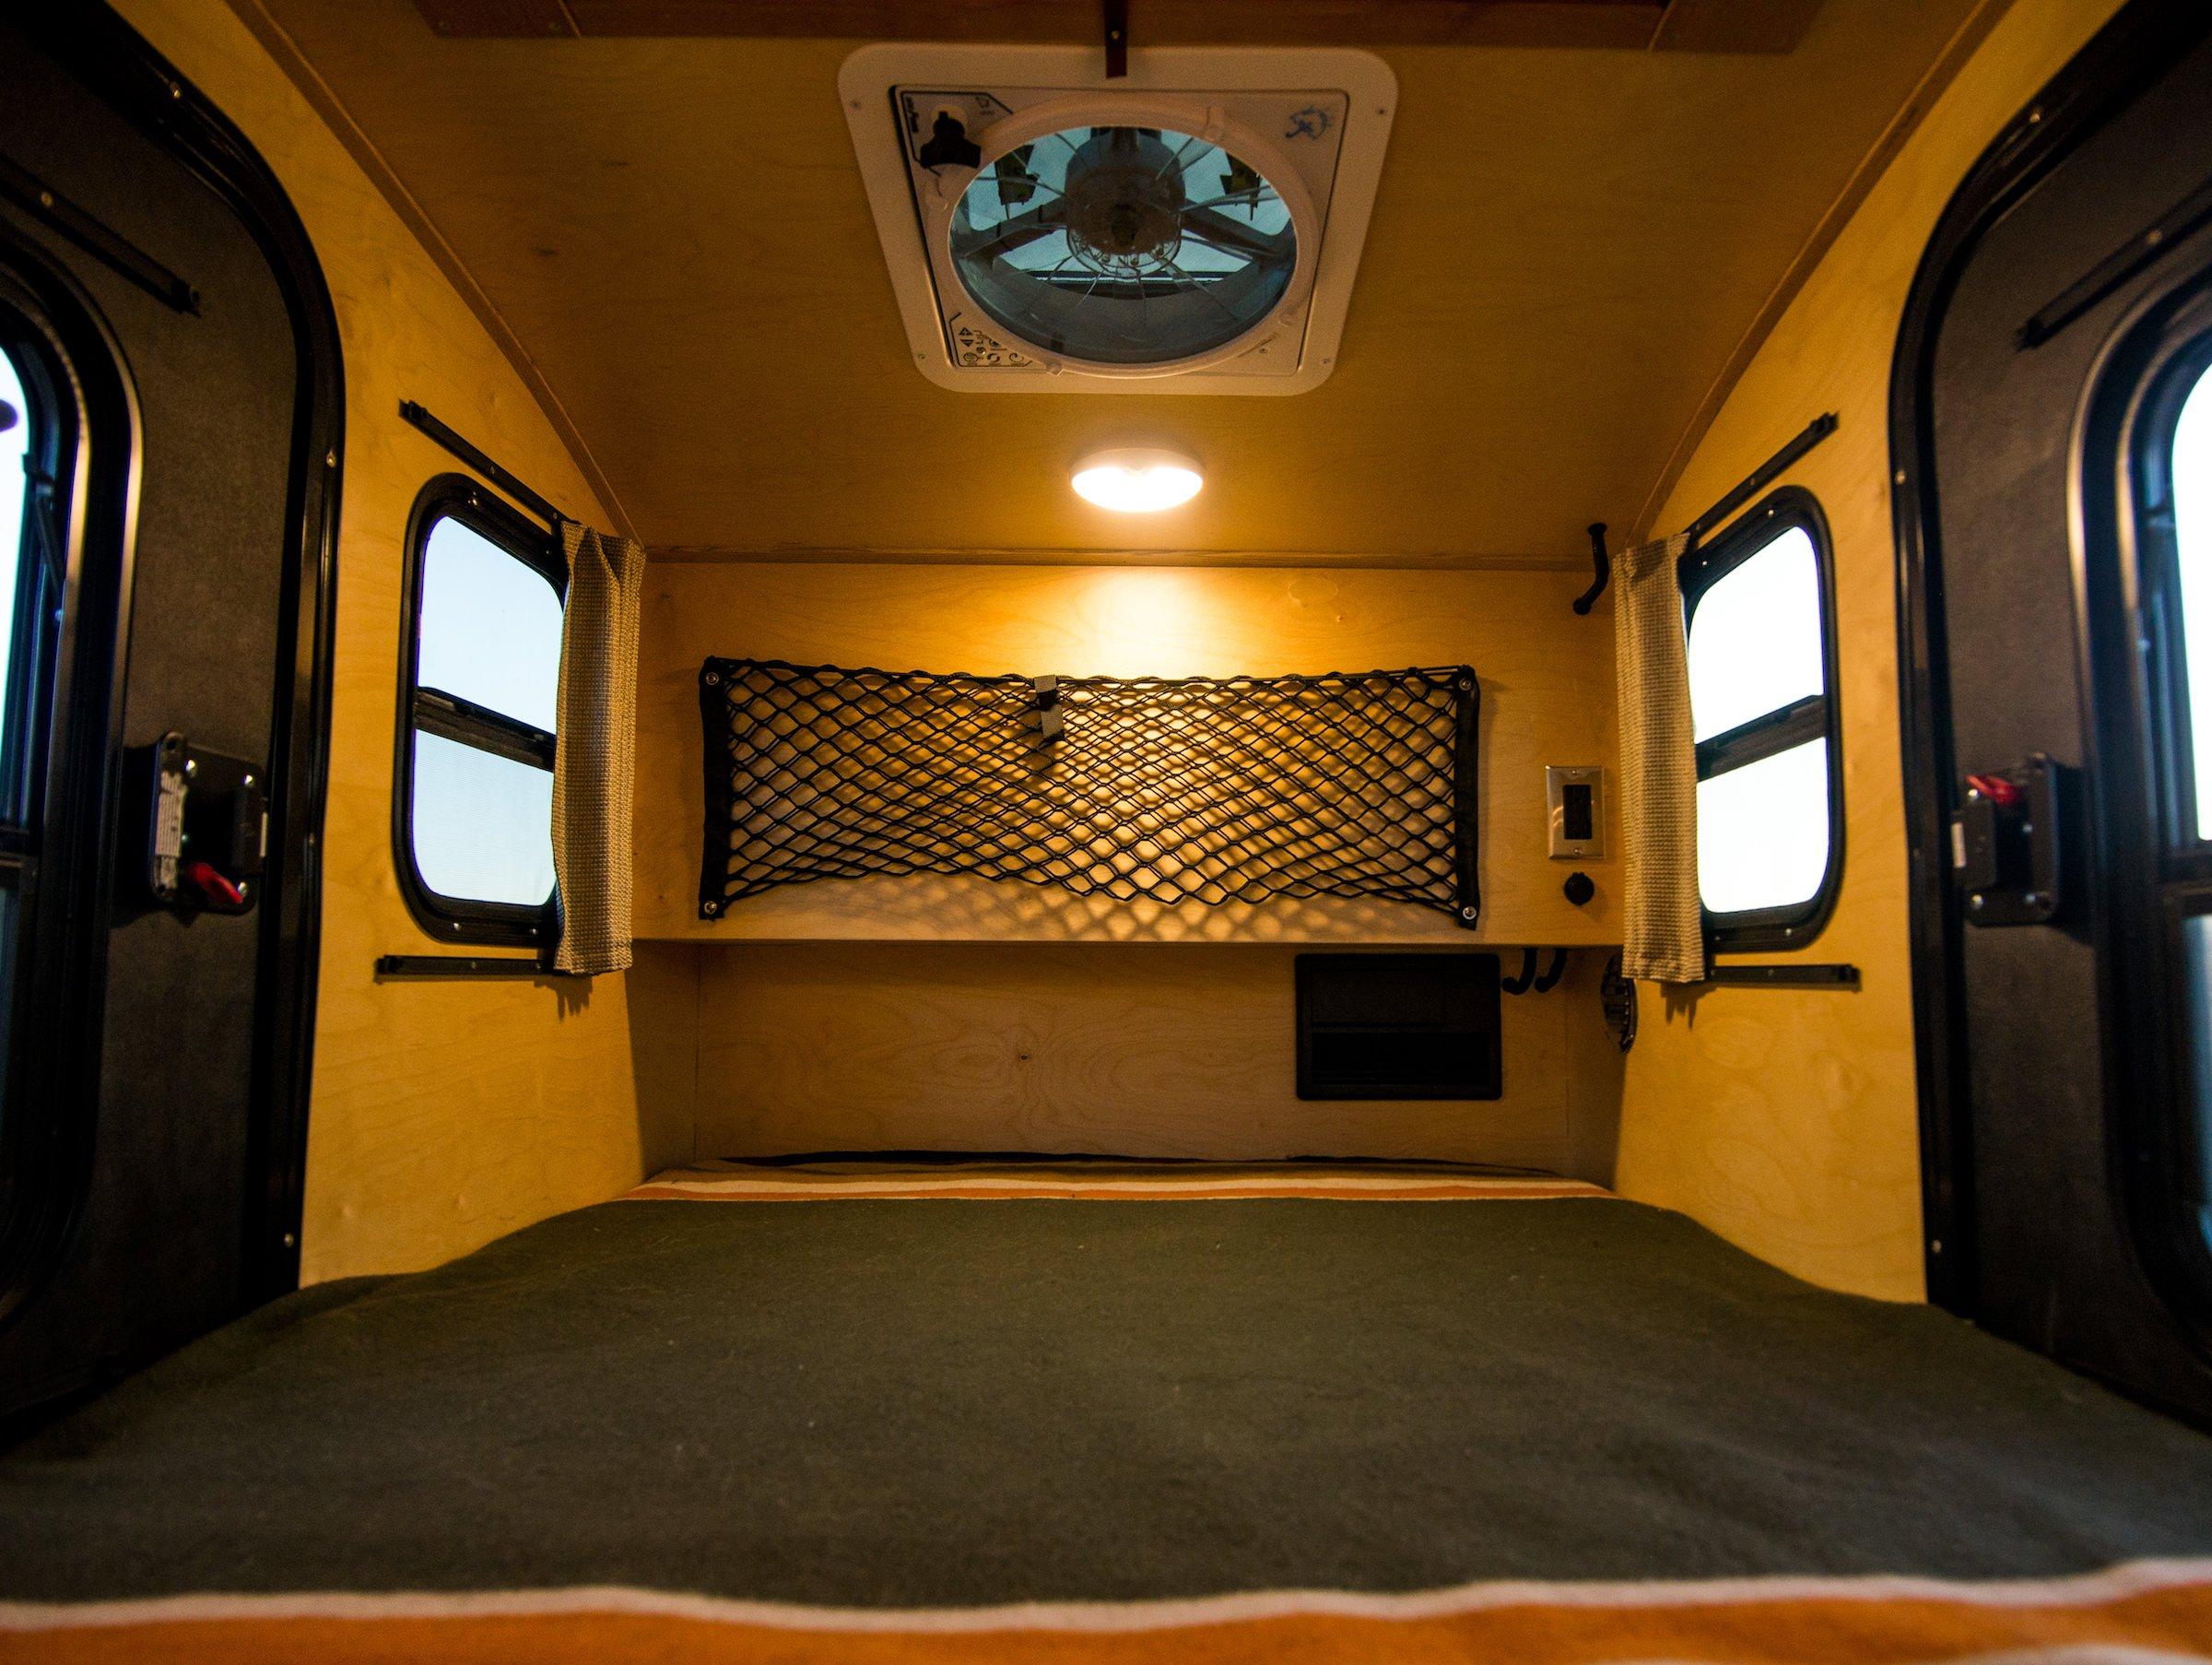 Timberleaf Pika Teardrop Camper Trailer 11 750 Usd